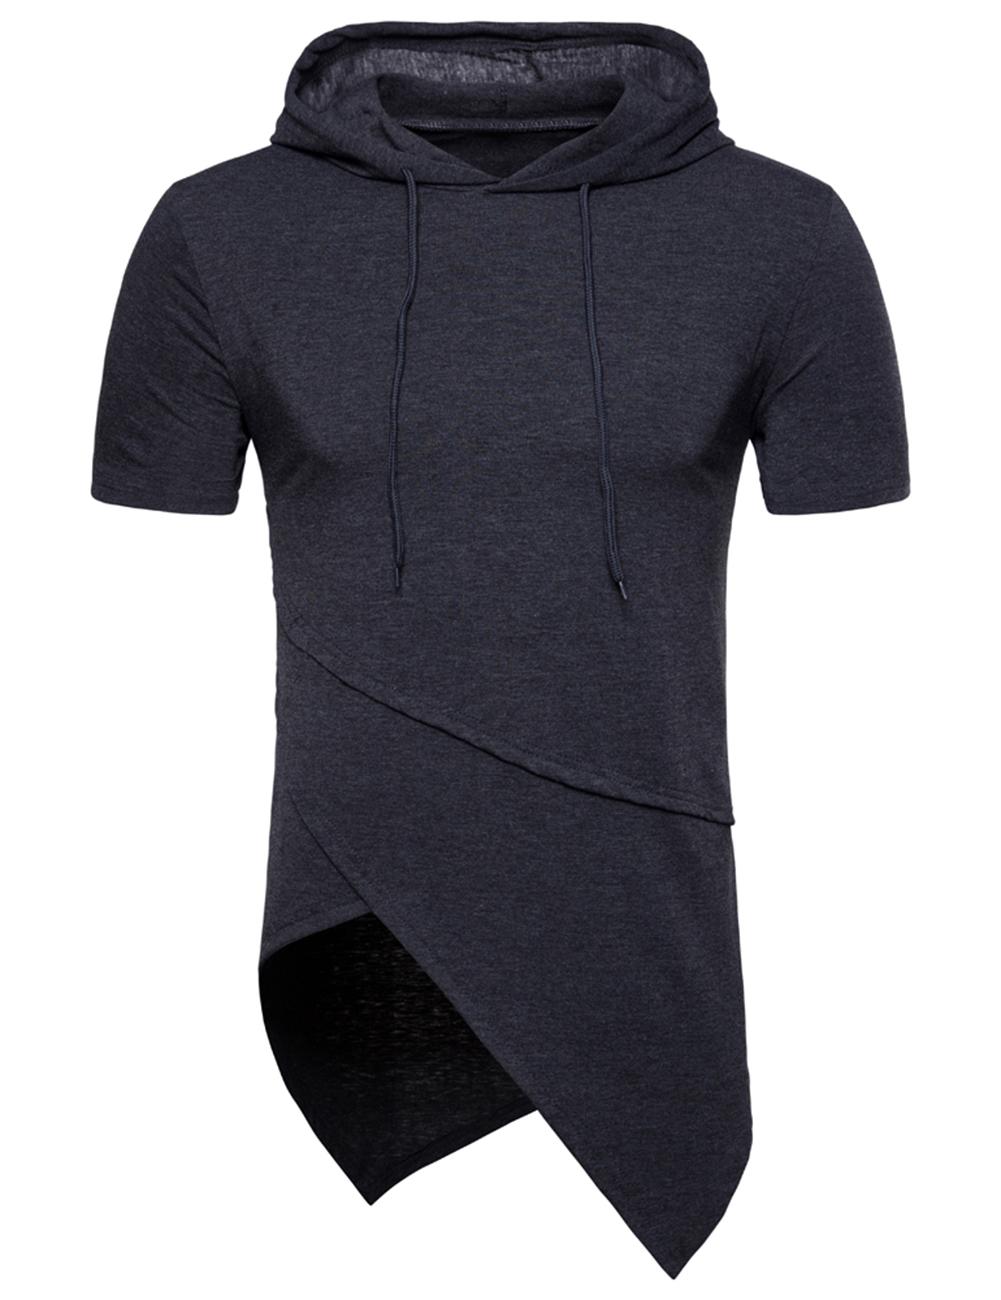 Man Stylish Short Sleeve Sweater Irregular Spliced Hooded Hip hop T-Shirt Tops Coat